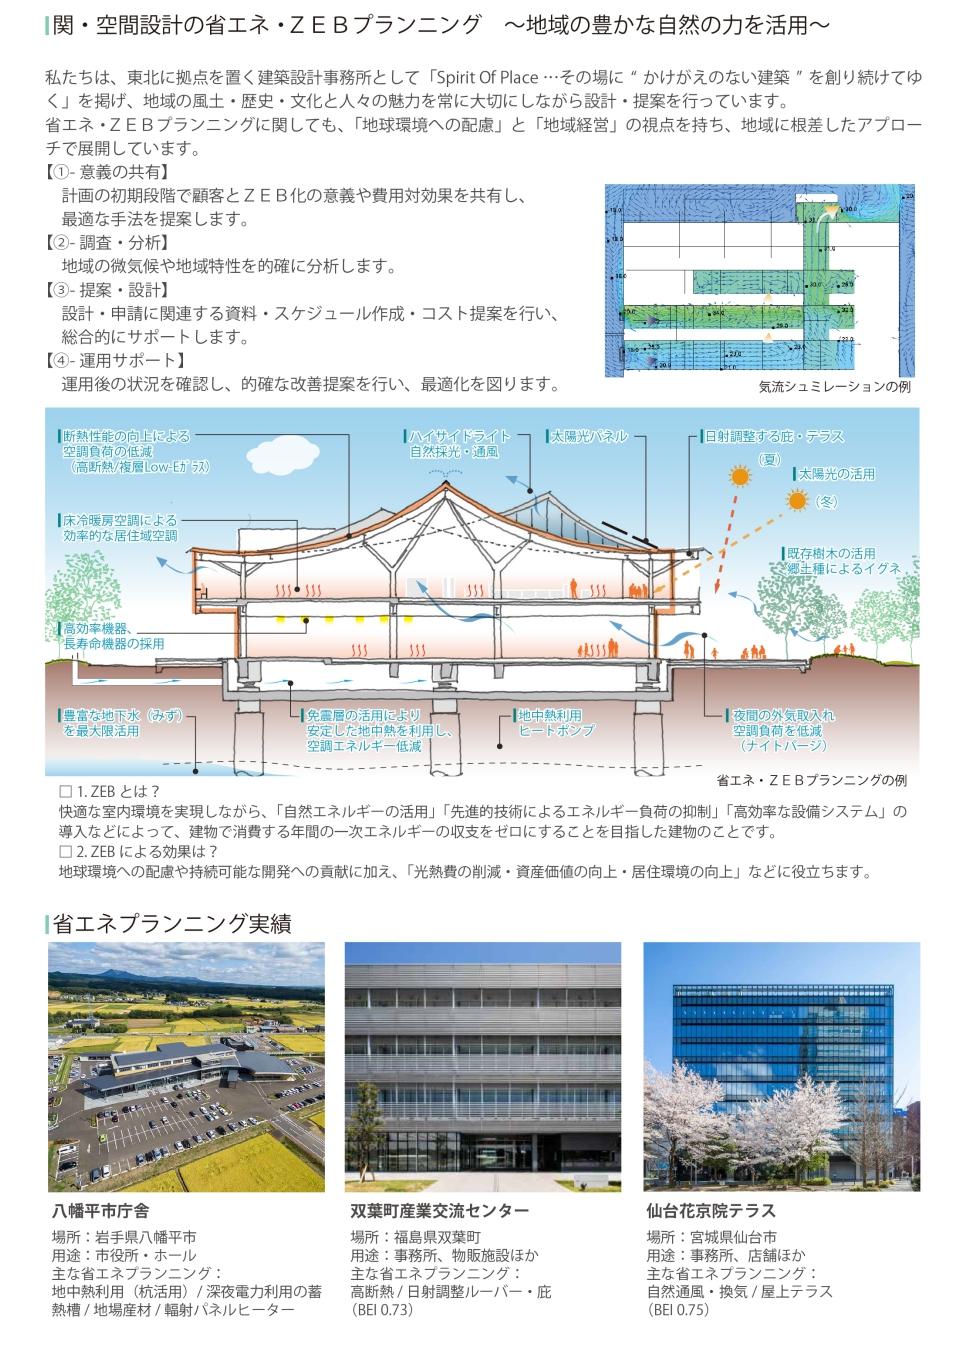 ZEB関係ホームページ公表-01